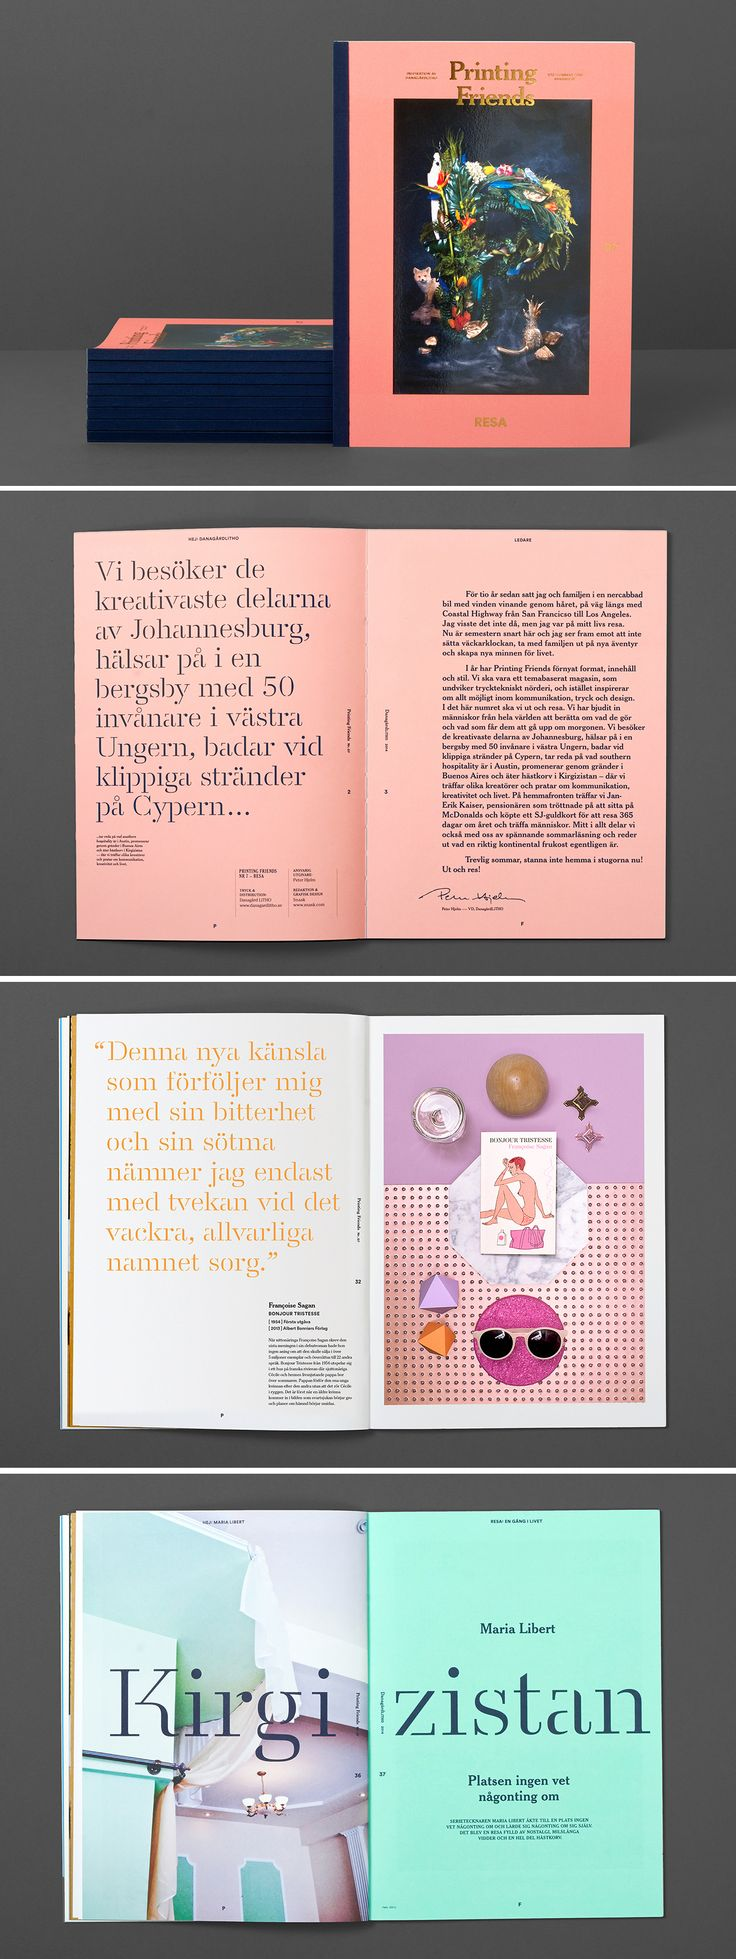 Printing Friends Magazine – Nr.7 Resa   SNASK